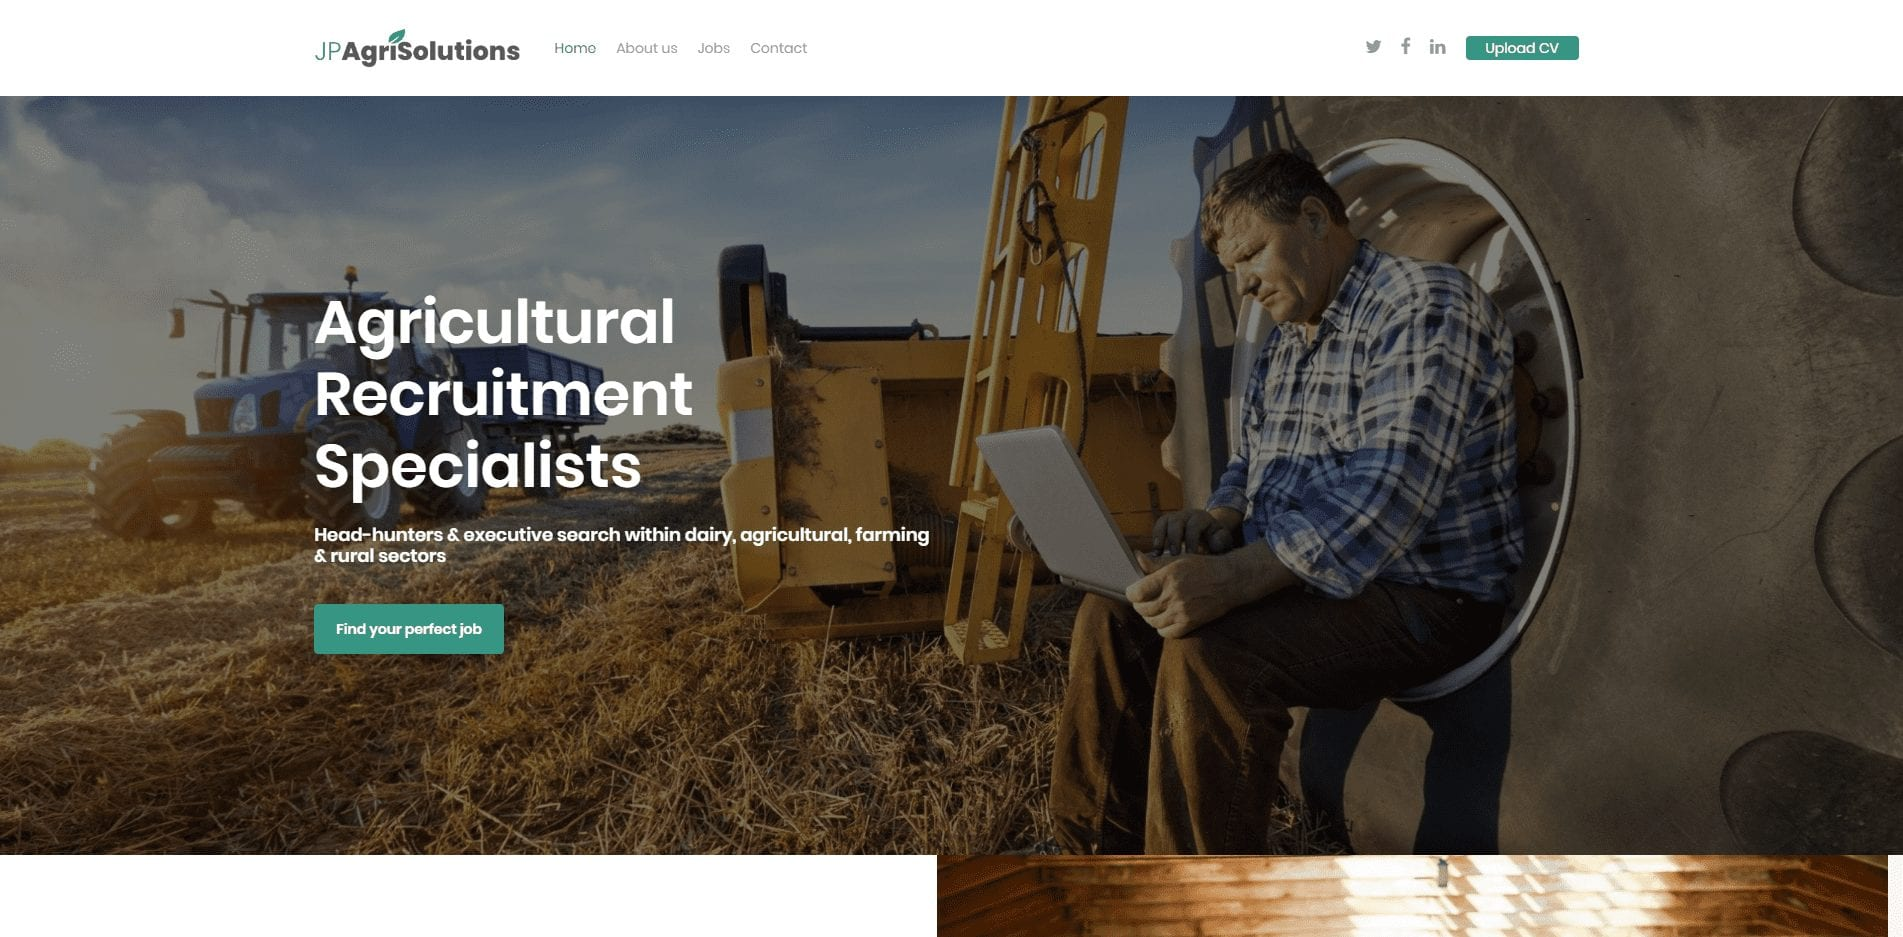 JP AGRI Solutions